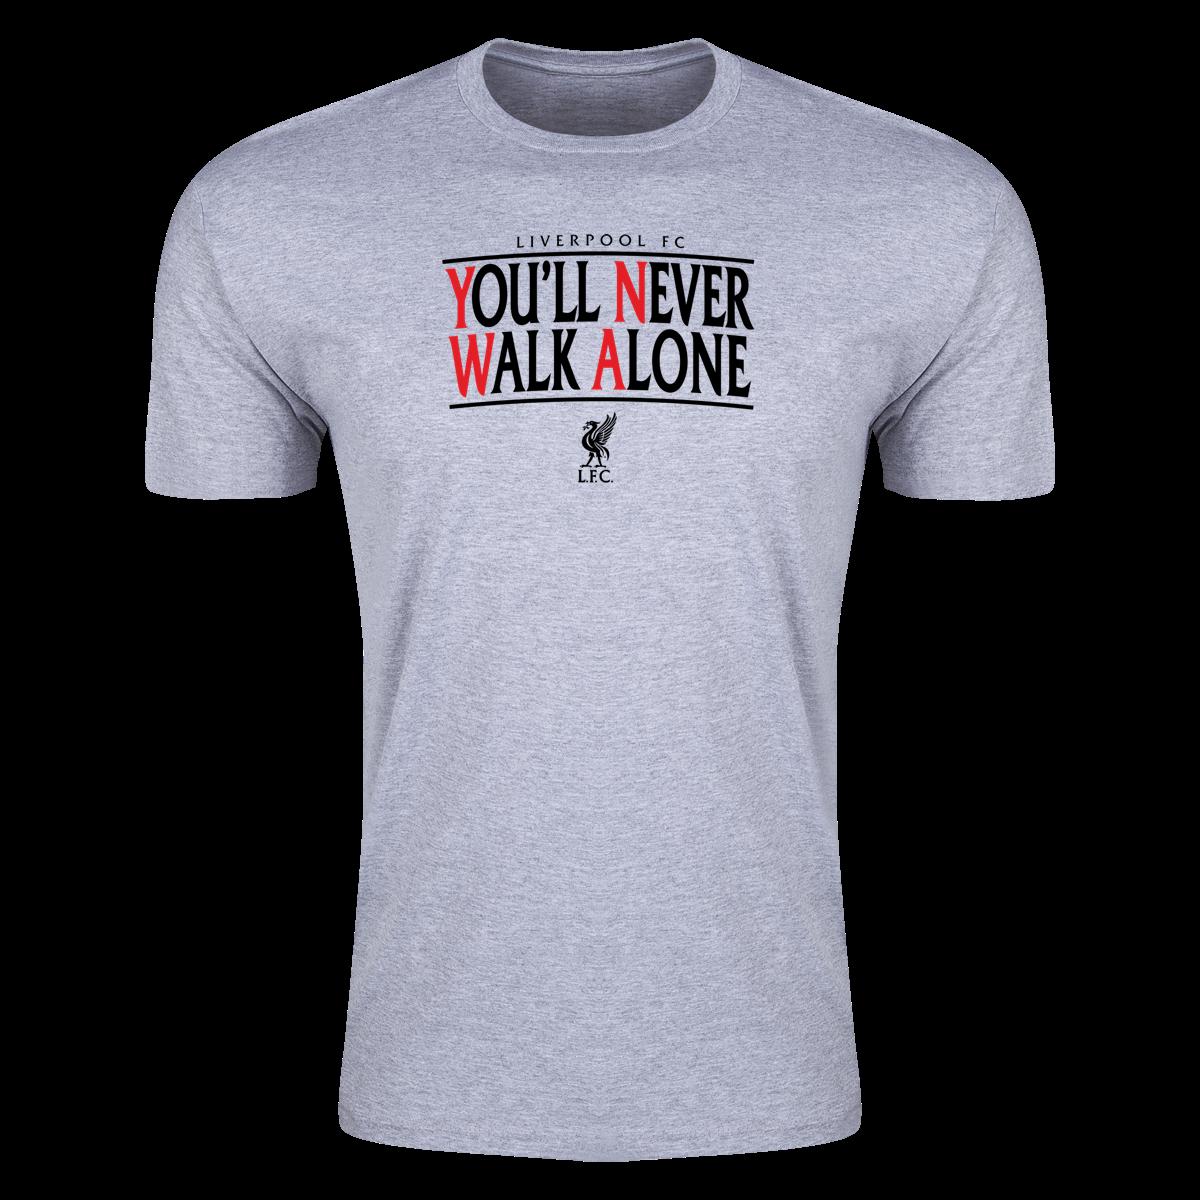 You/'ll Never Walk Alone T-shirt Liverpool Fan Club Adult /& Kids Tee Top